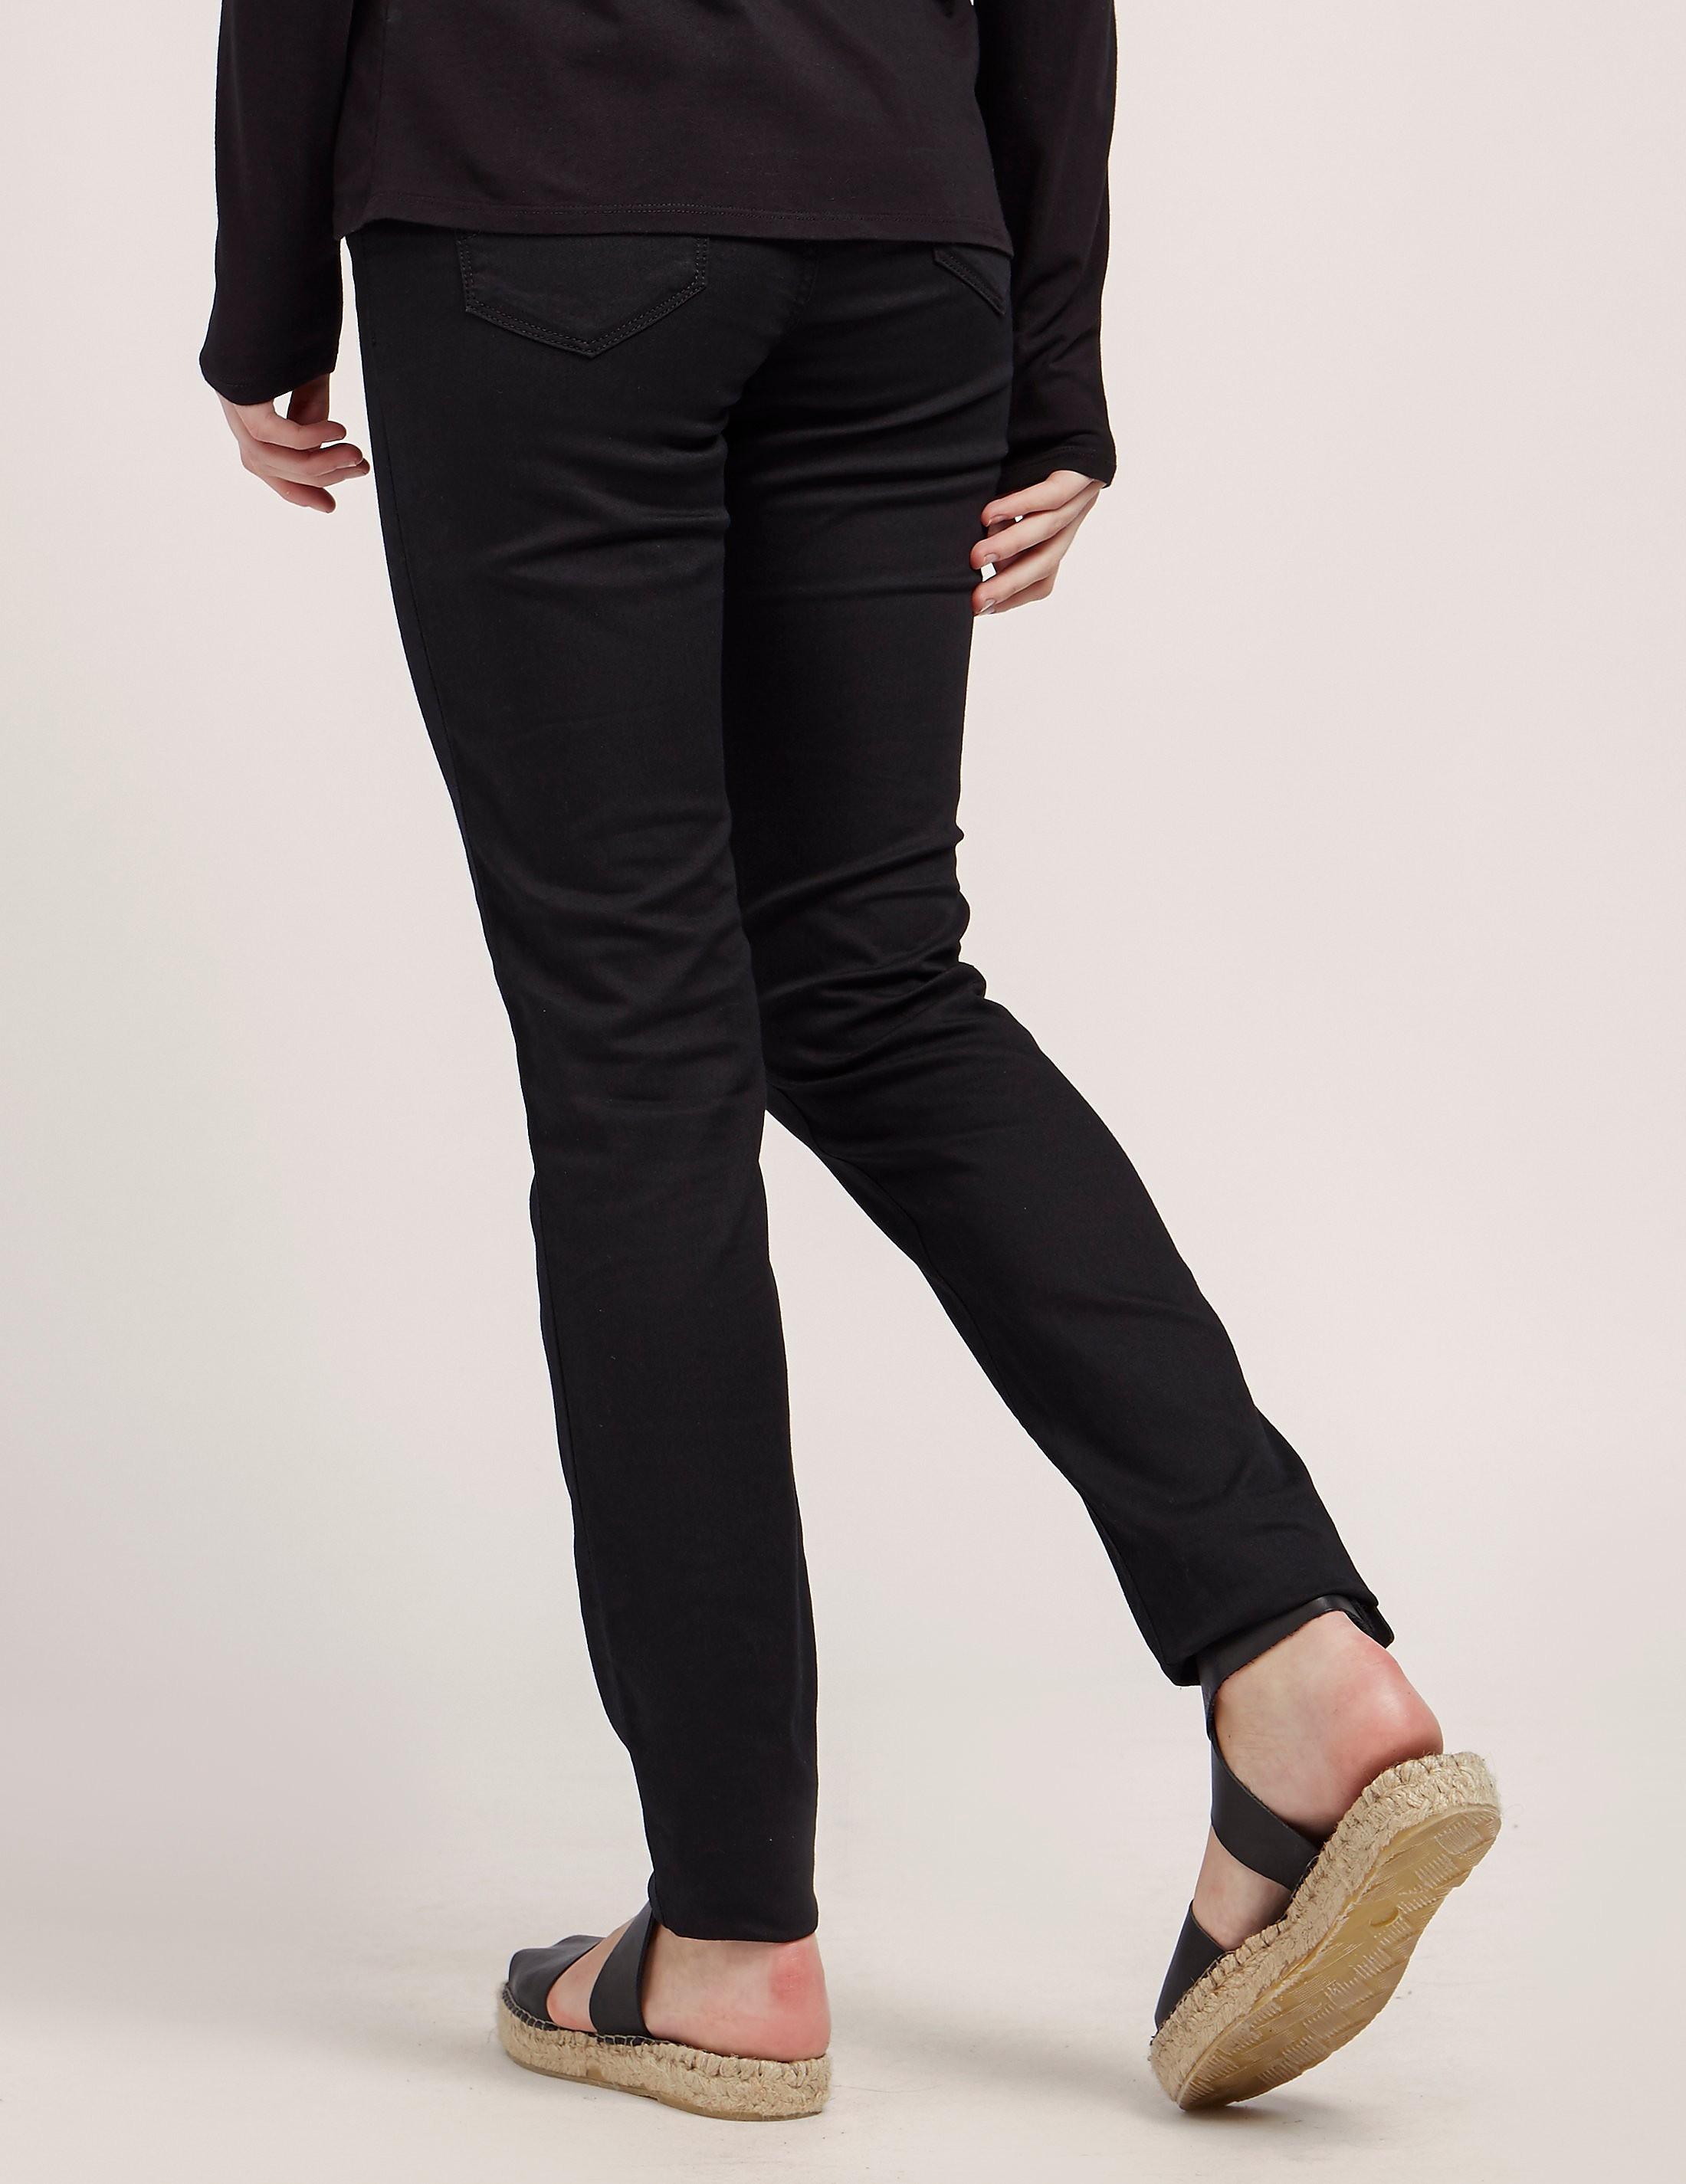 Armani Jeans J20 Skinny Jeans